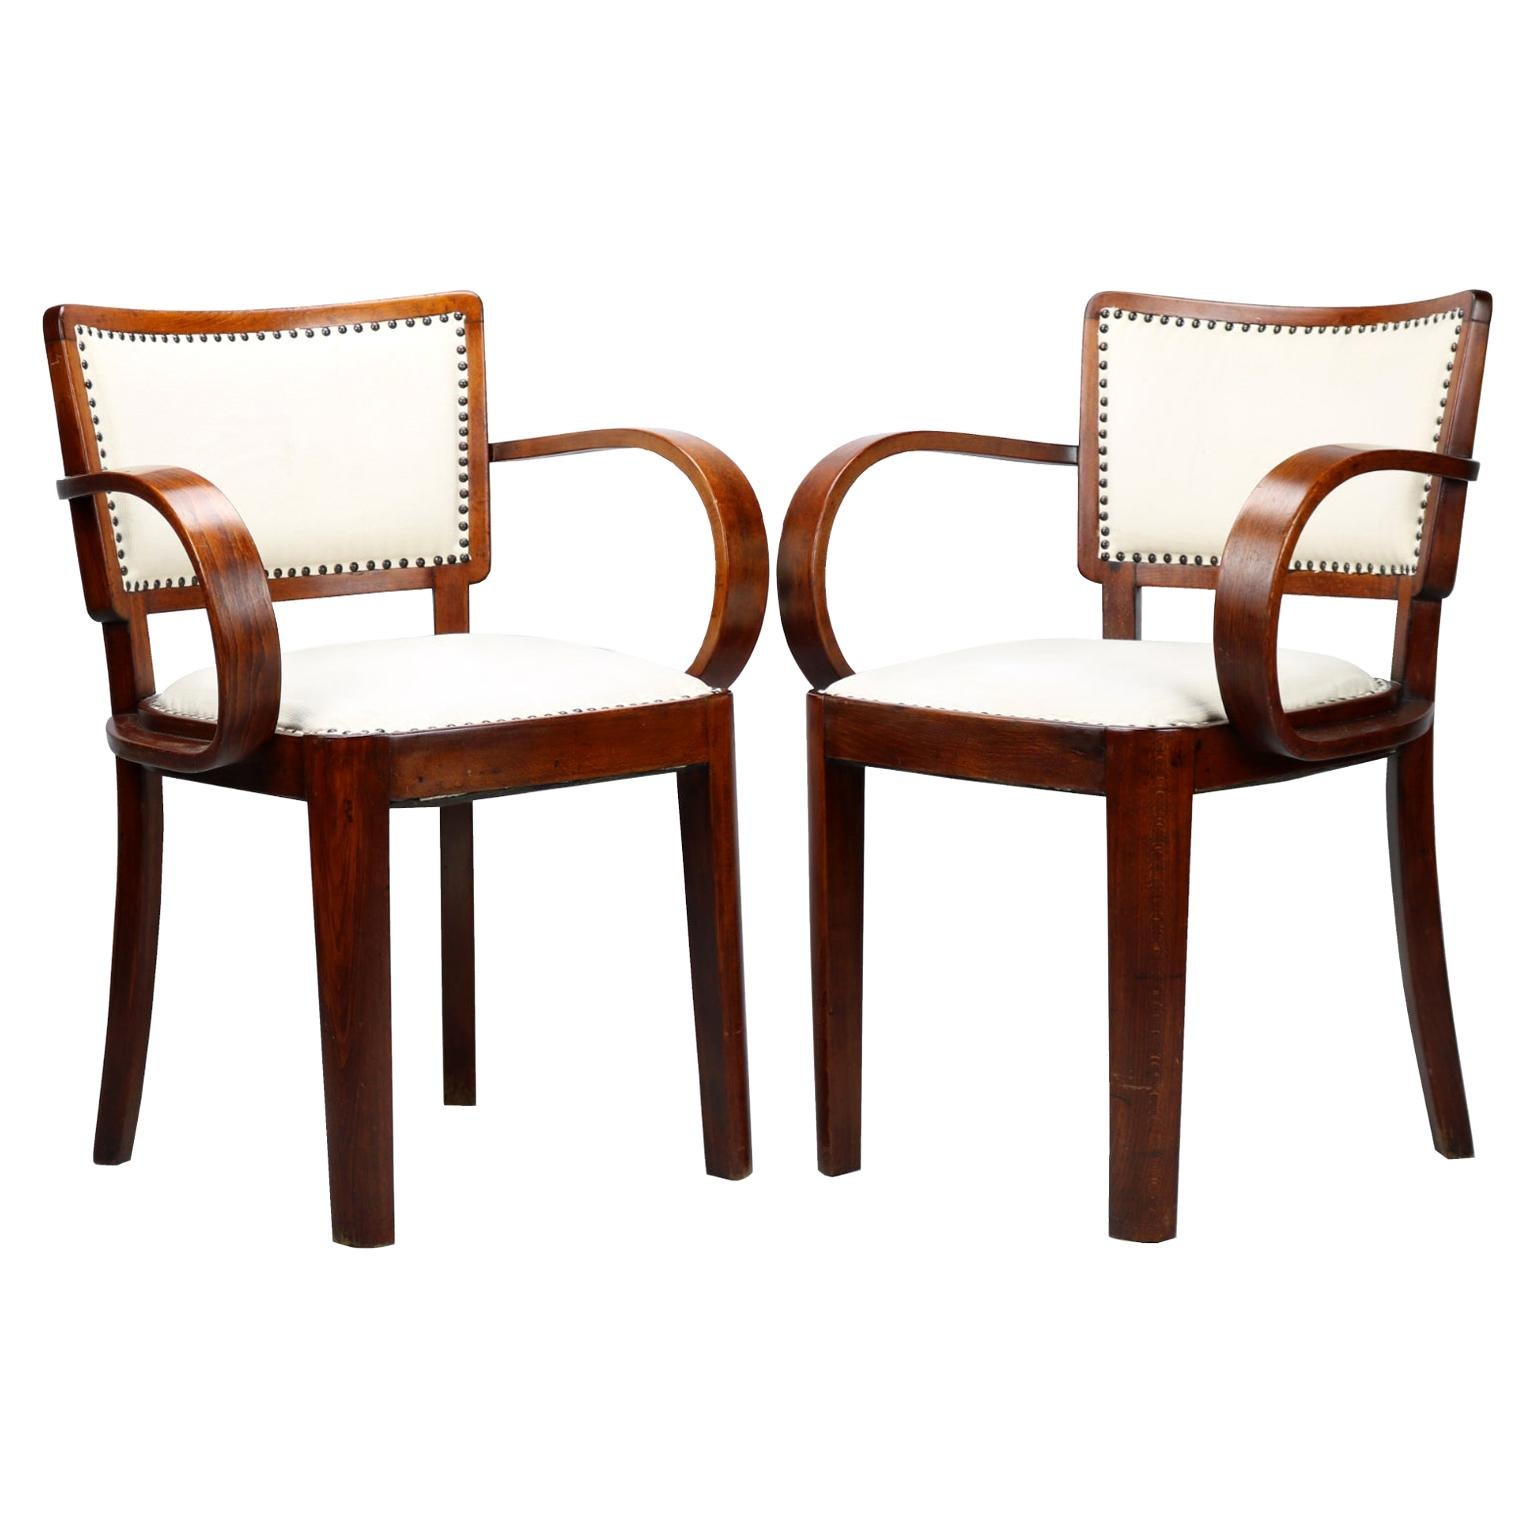 Pair of Art Deco Armchairs, circa 1930